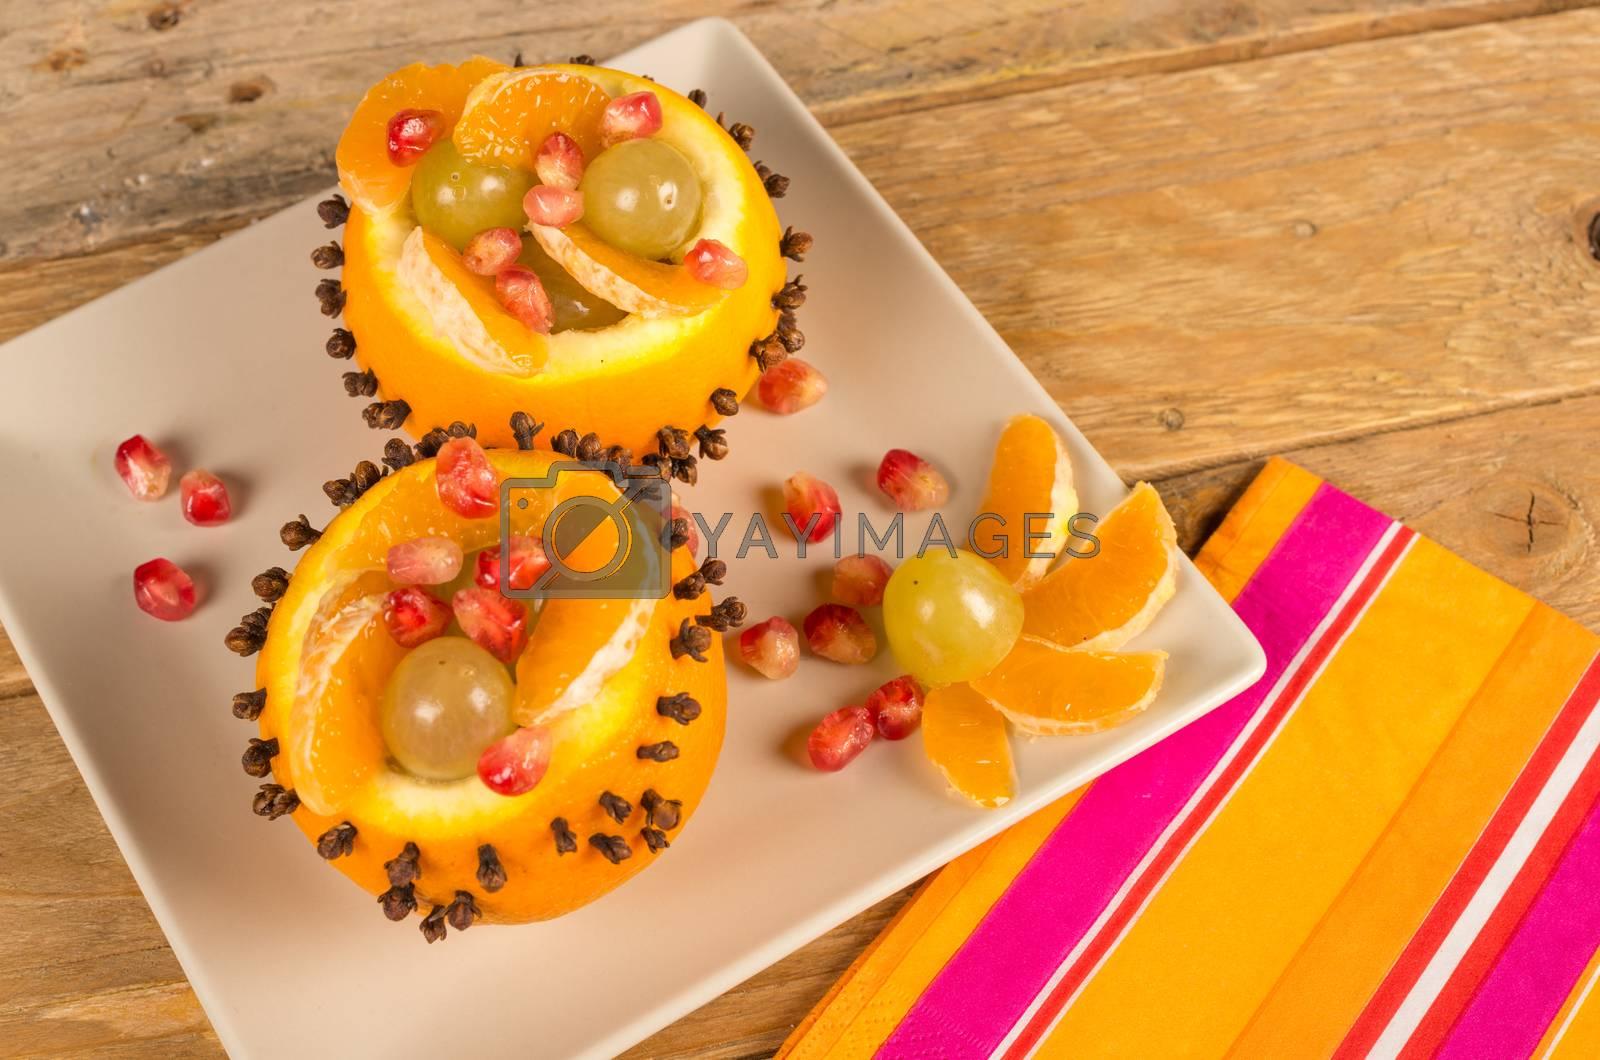 Royalty free image of Fresh fruit salad by hemeroskopion